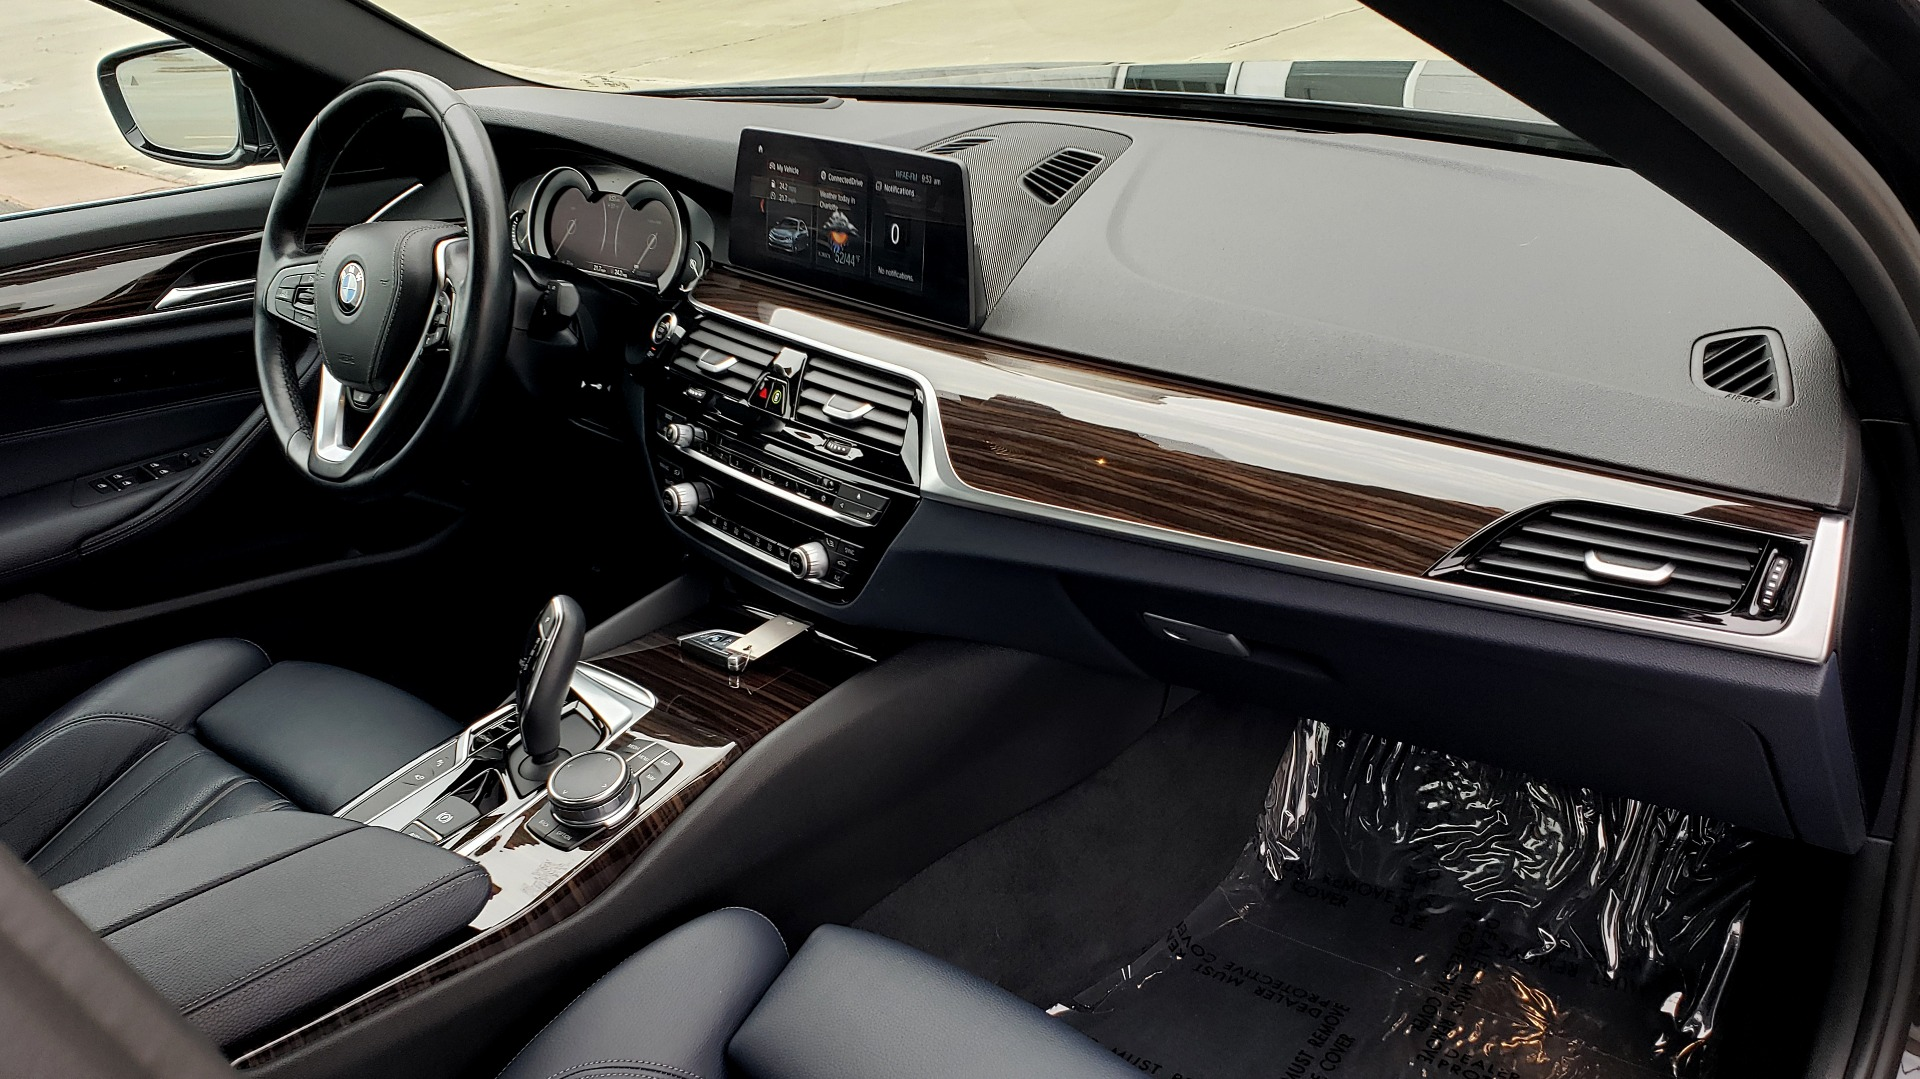 Used 2017 BMW 5 SERIES 530IXDRIVE / PREM PKG / DRVR ASST PLUS / CLD WTHR / APPLE CARPLAY for sale Sold at Formula Imports in Charlotte NC 28227 69